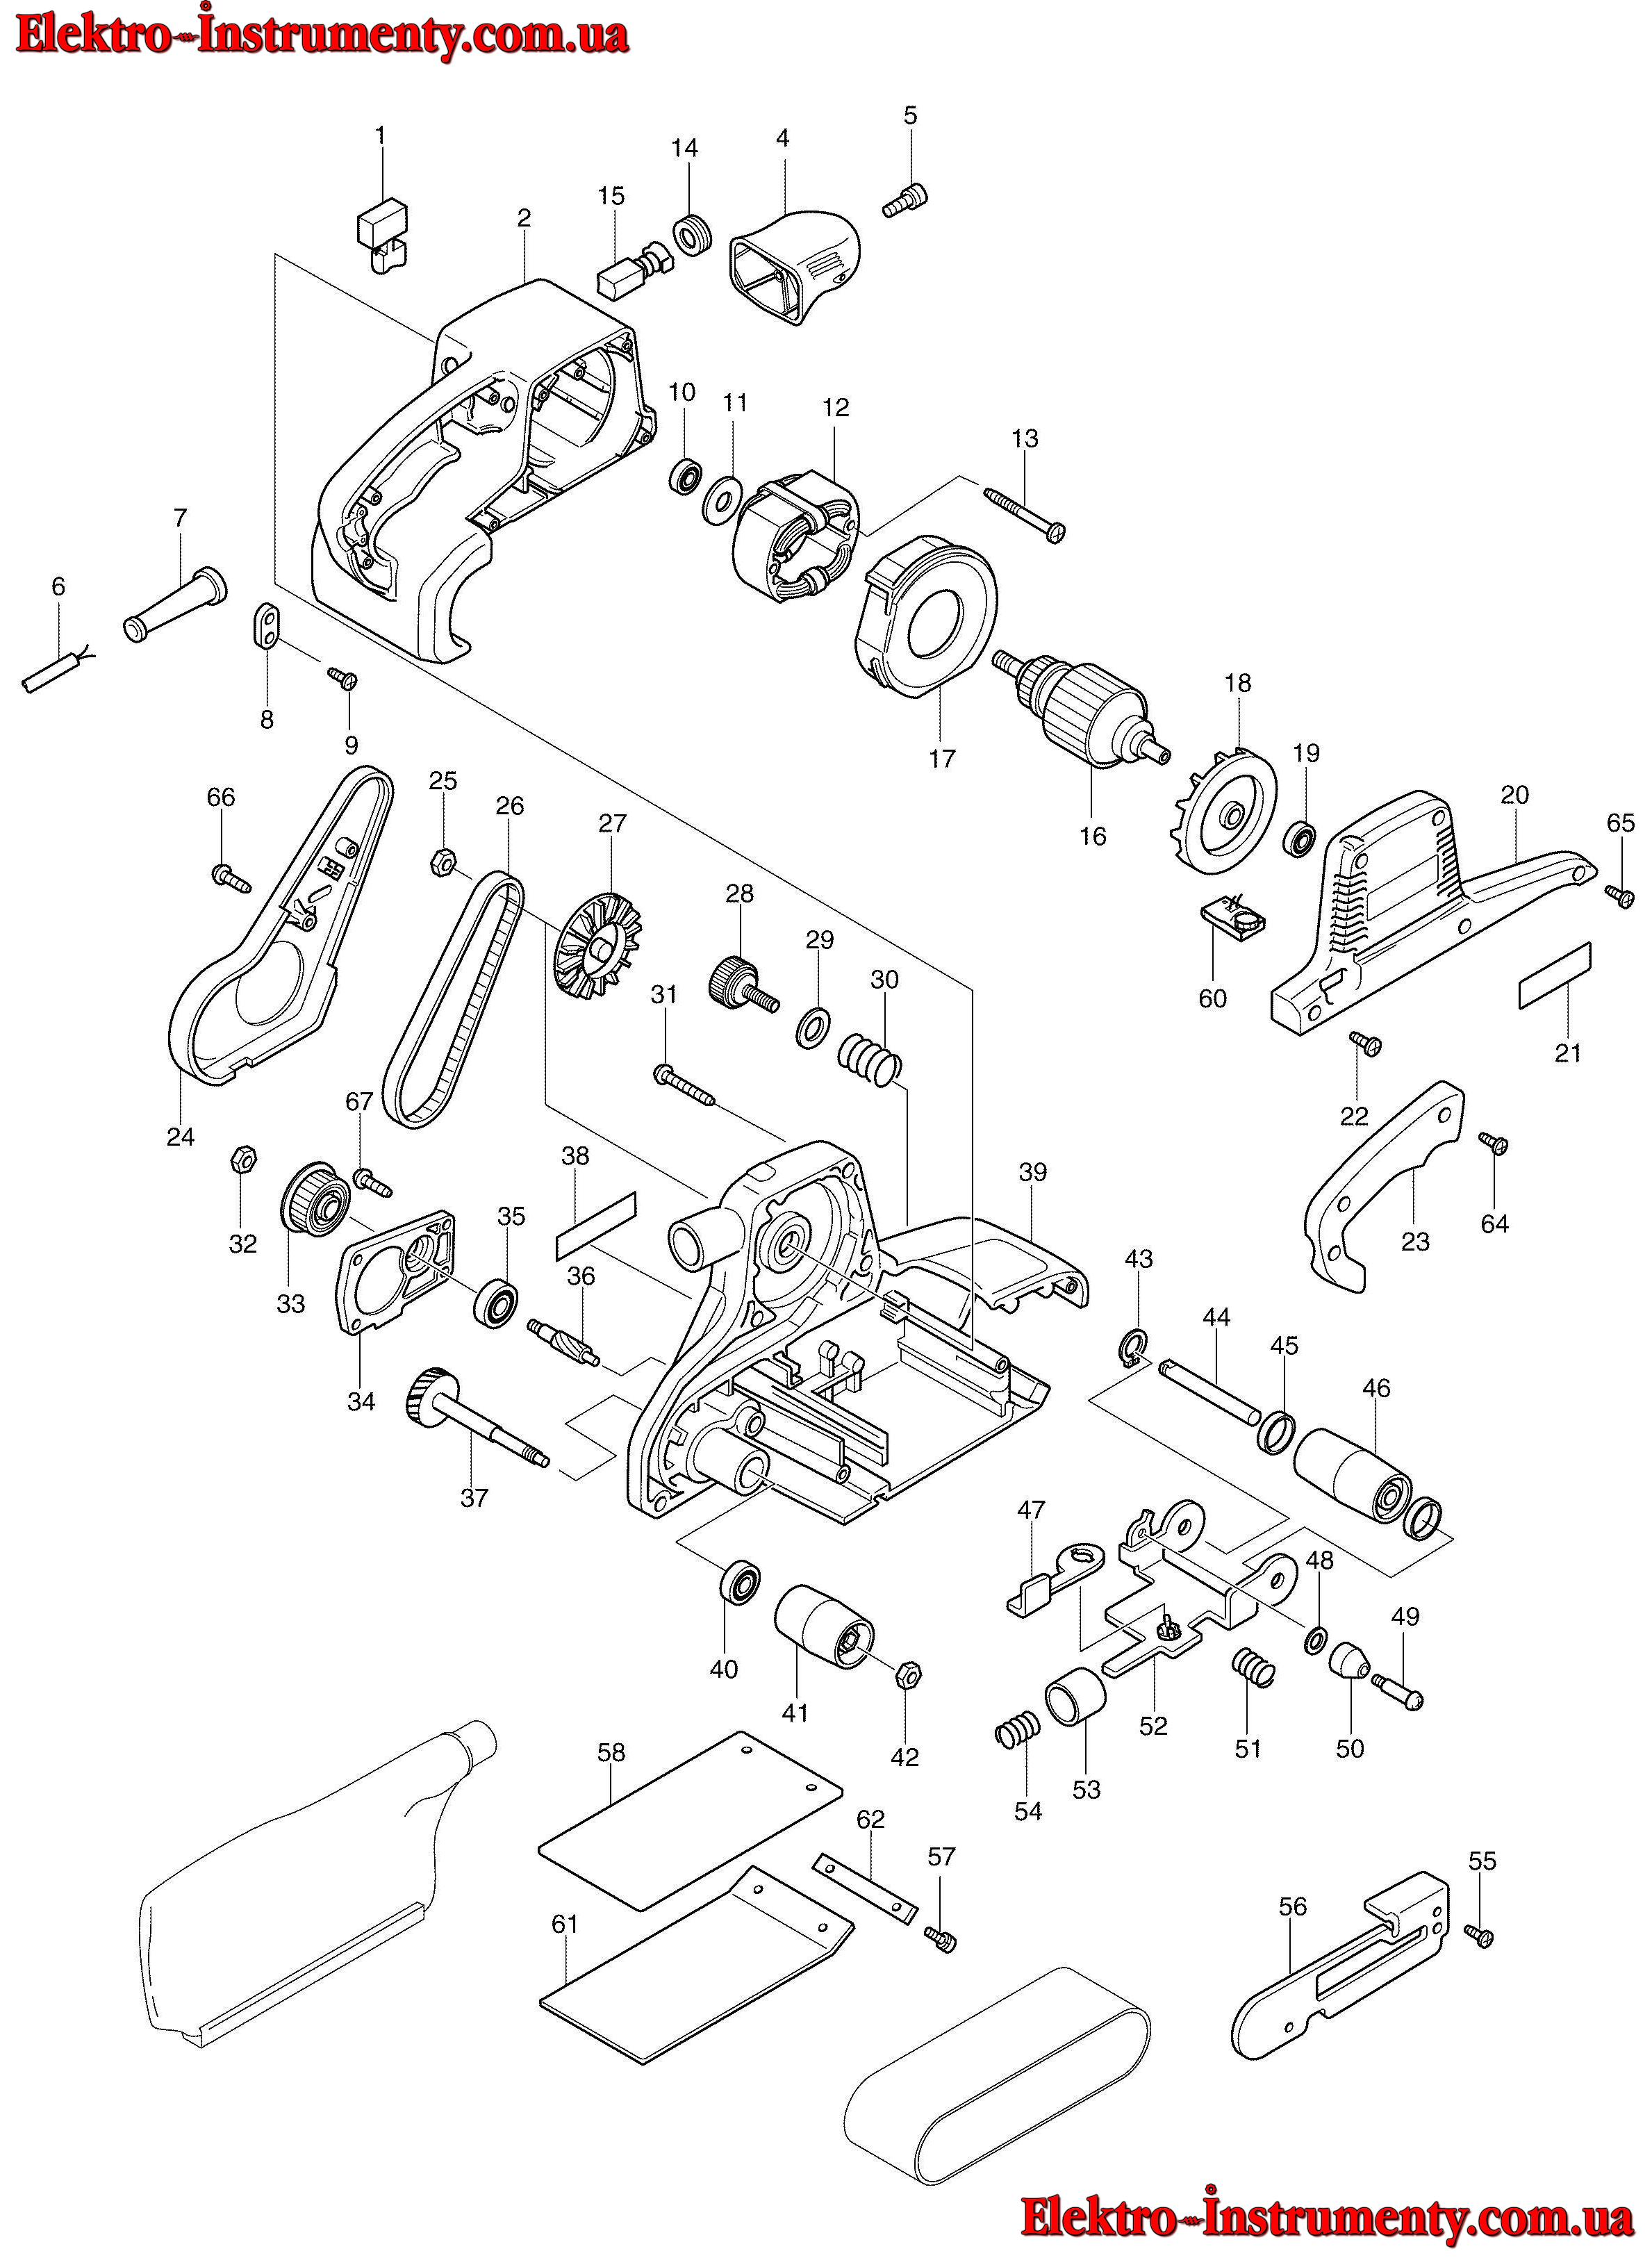 Шлифмашинка макита 9911 ремонт своими руками 55